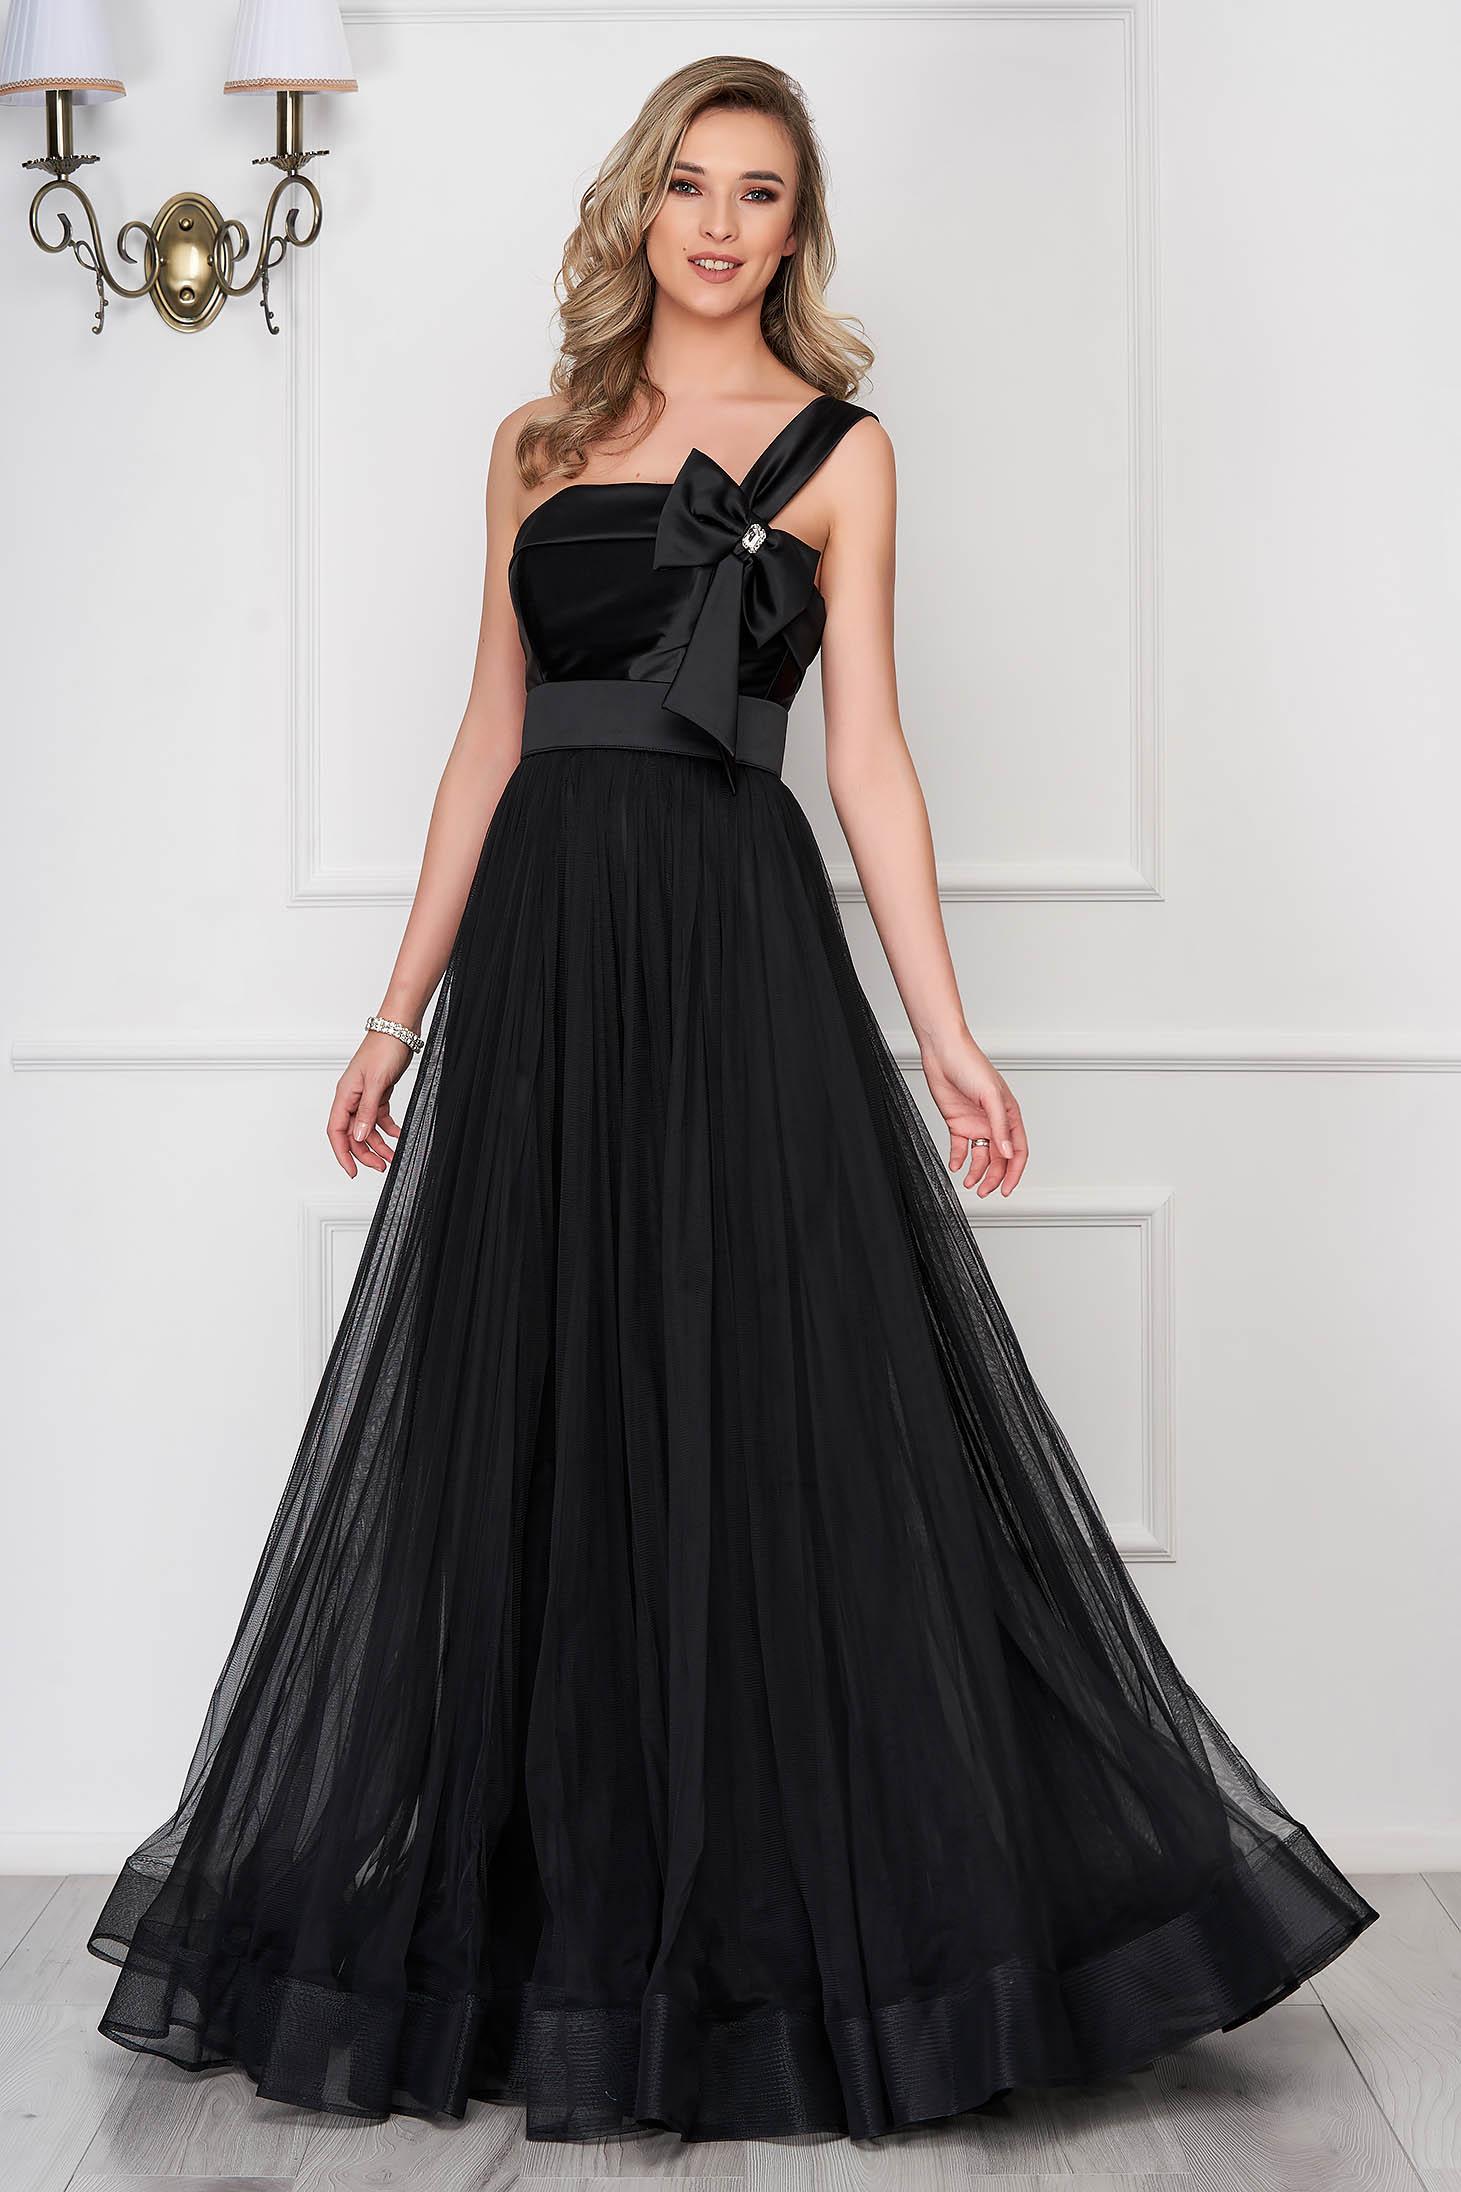 Ana Radu occasional black veil dress with bow shaped accessory